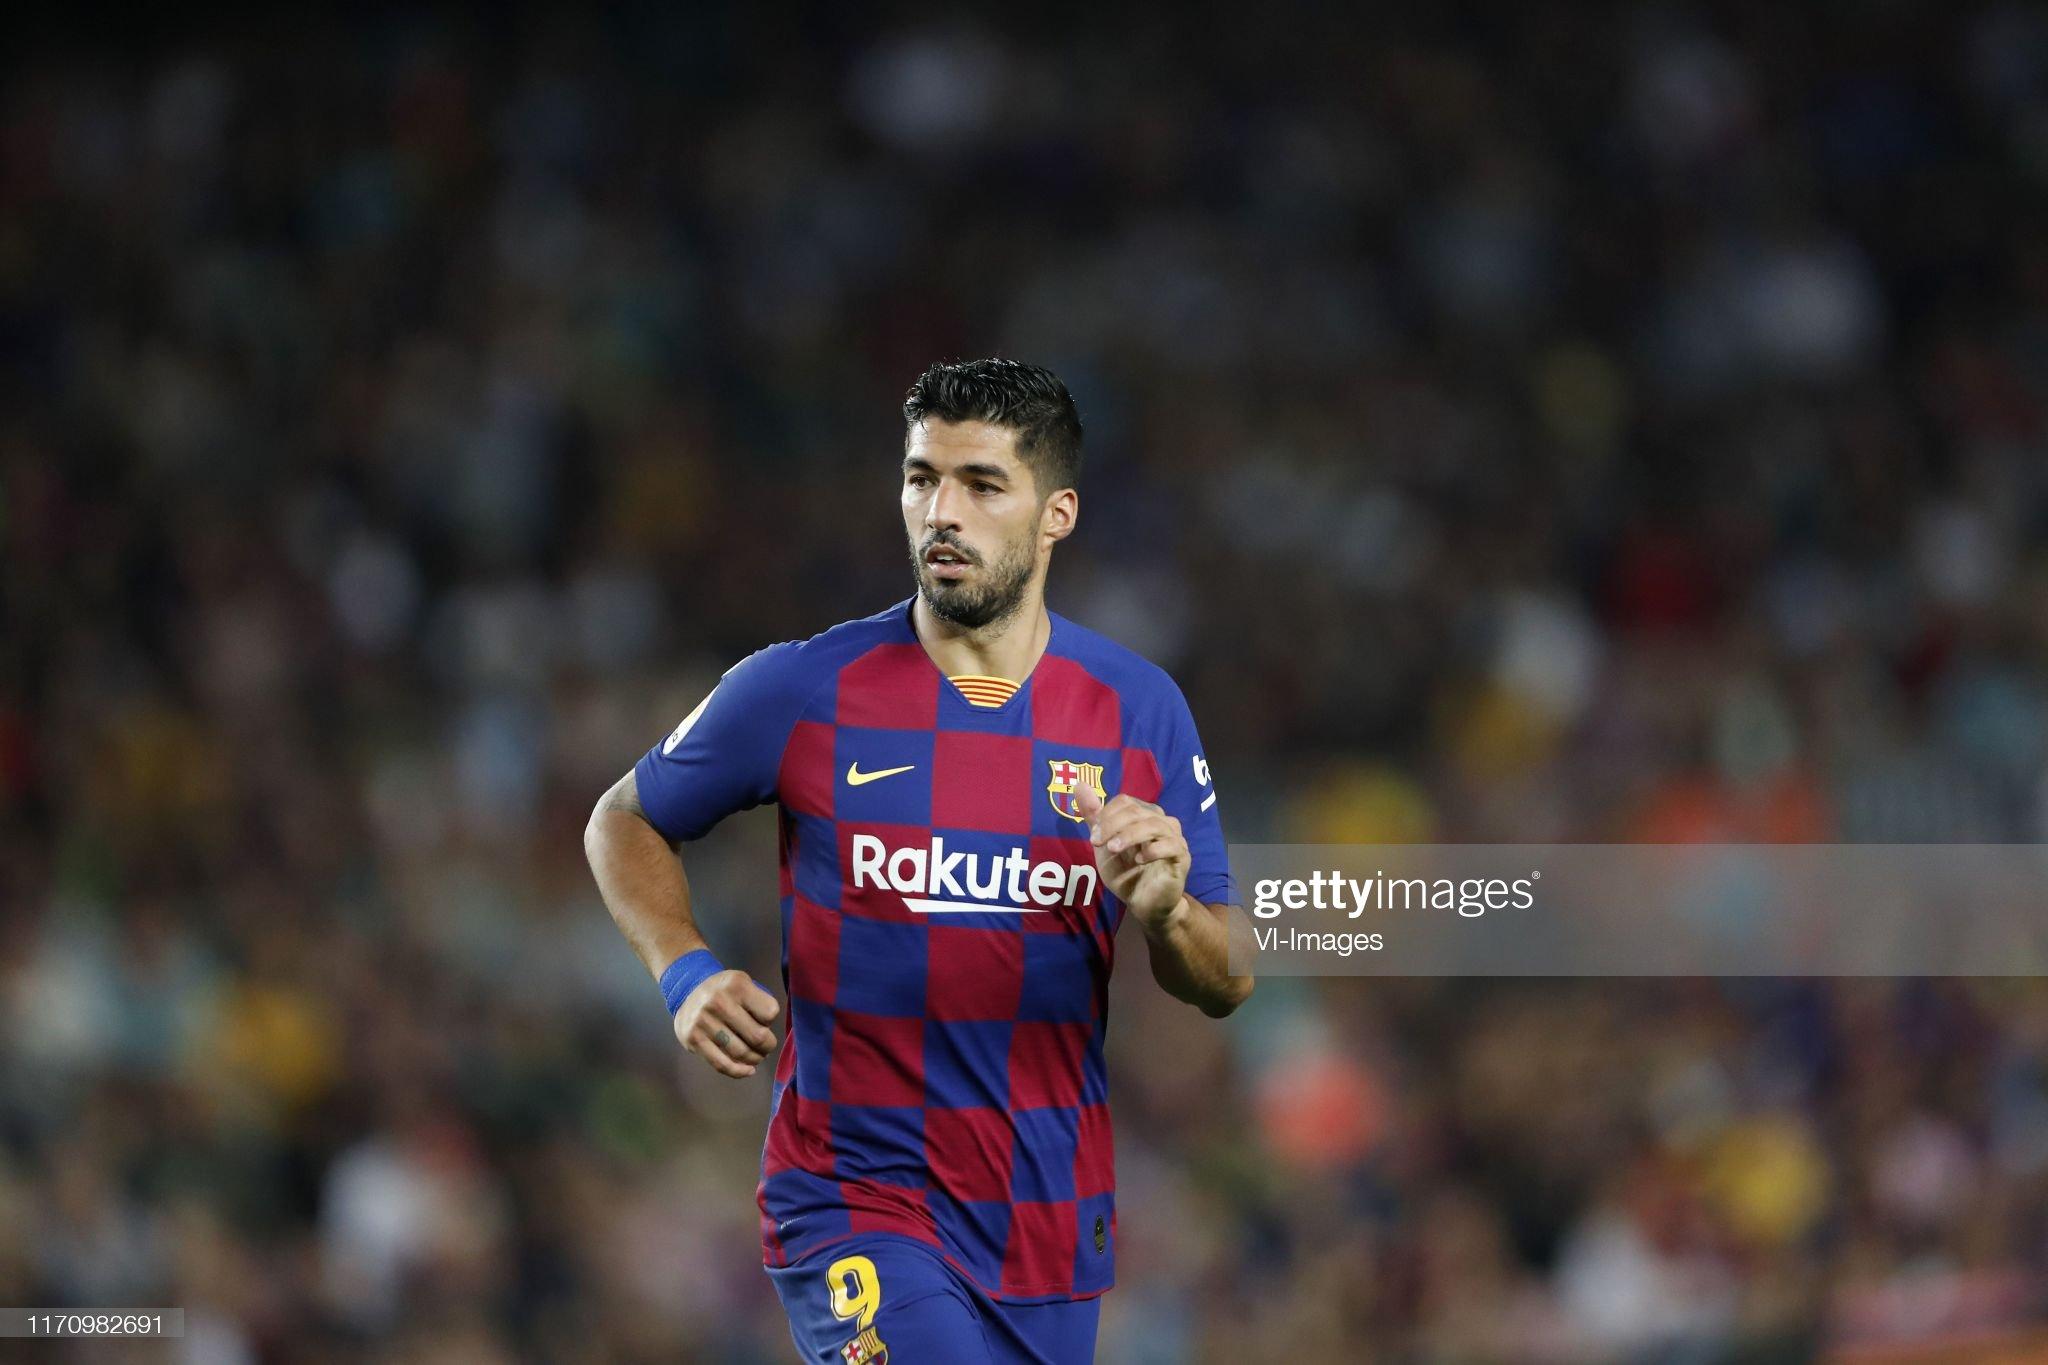 صور مباراة : برشلونة - فياريال 2-1 ( 24-09-2019 )  Luis-suarez-of-fc-barcelona-during-the-laliga-santander-match-between-picture-id1170982691?s=2048x2048